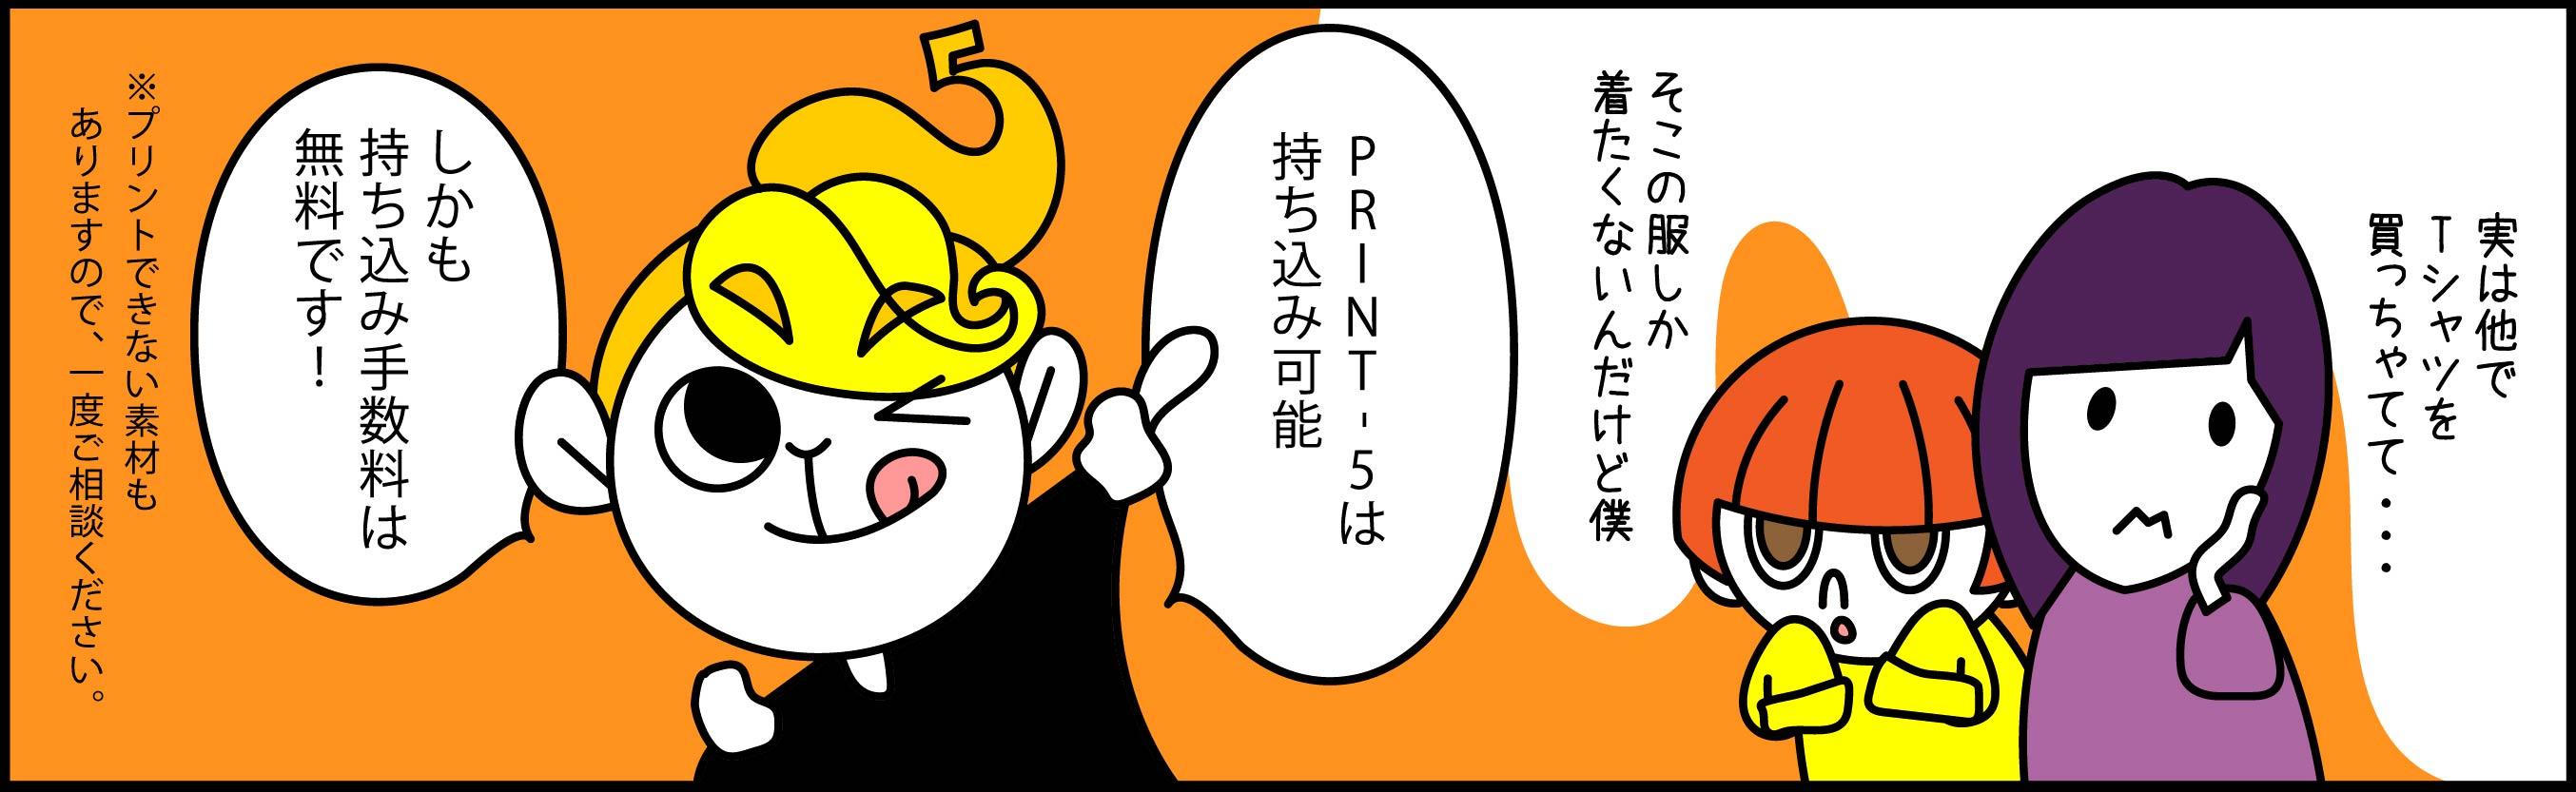 HP漫画2-04